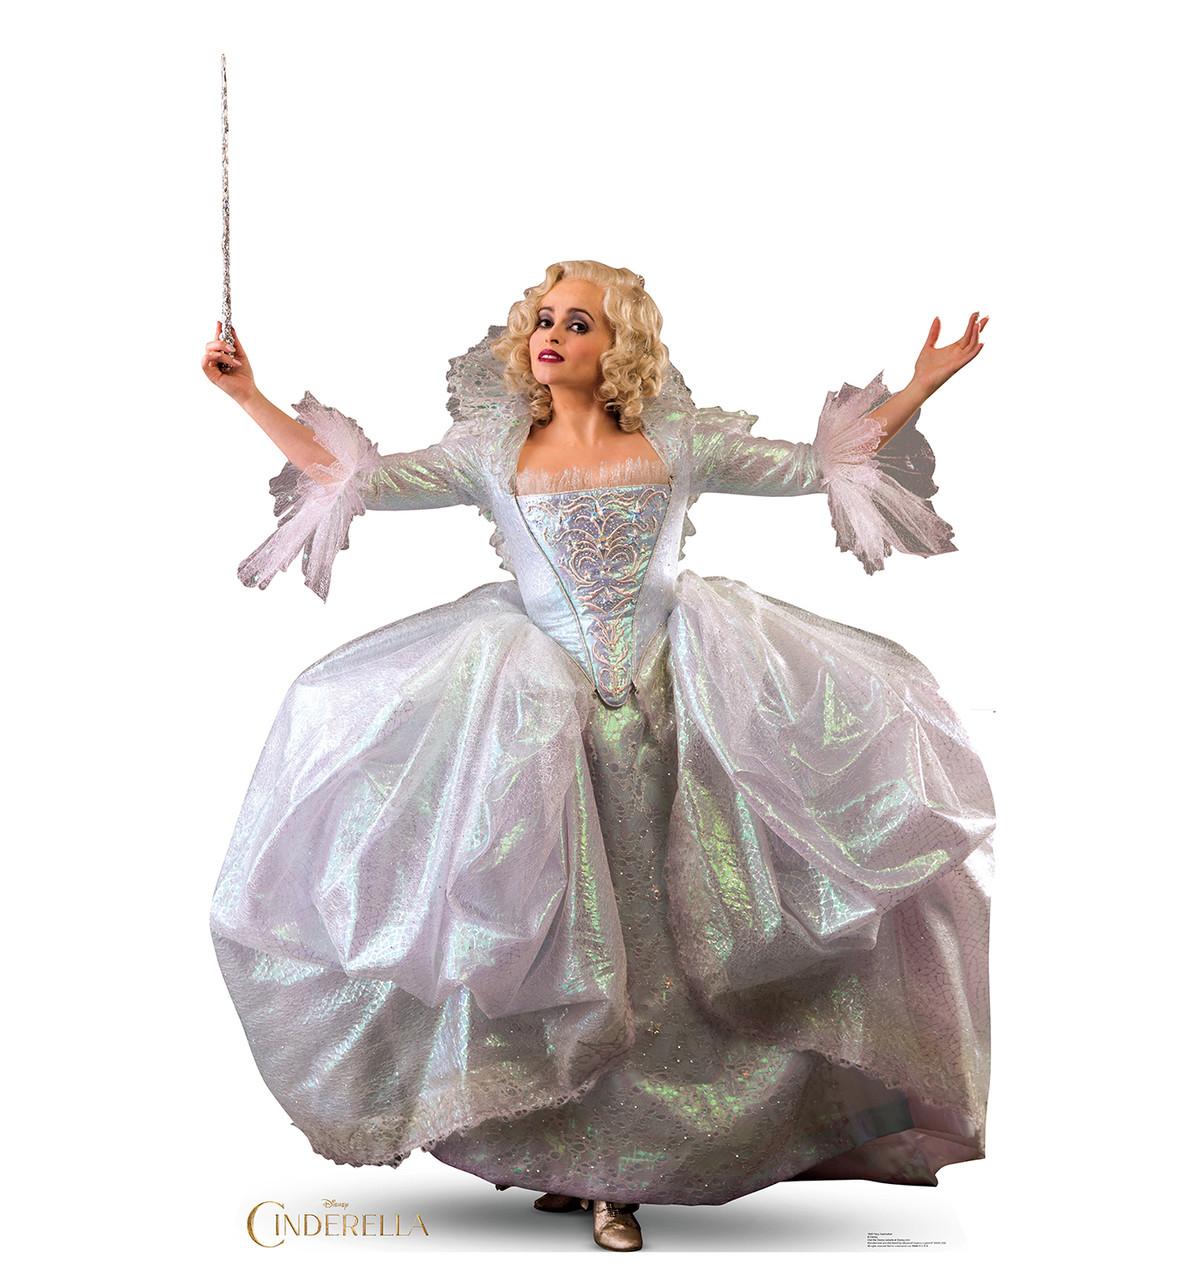 Uncategorized Fairy Godmother Cinderella life size fairy godmother disney movie cinderella cardboard standup cinderella